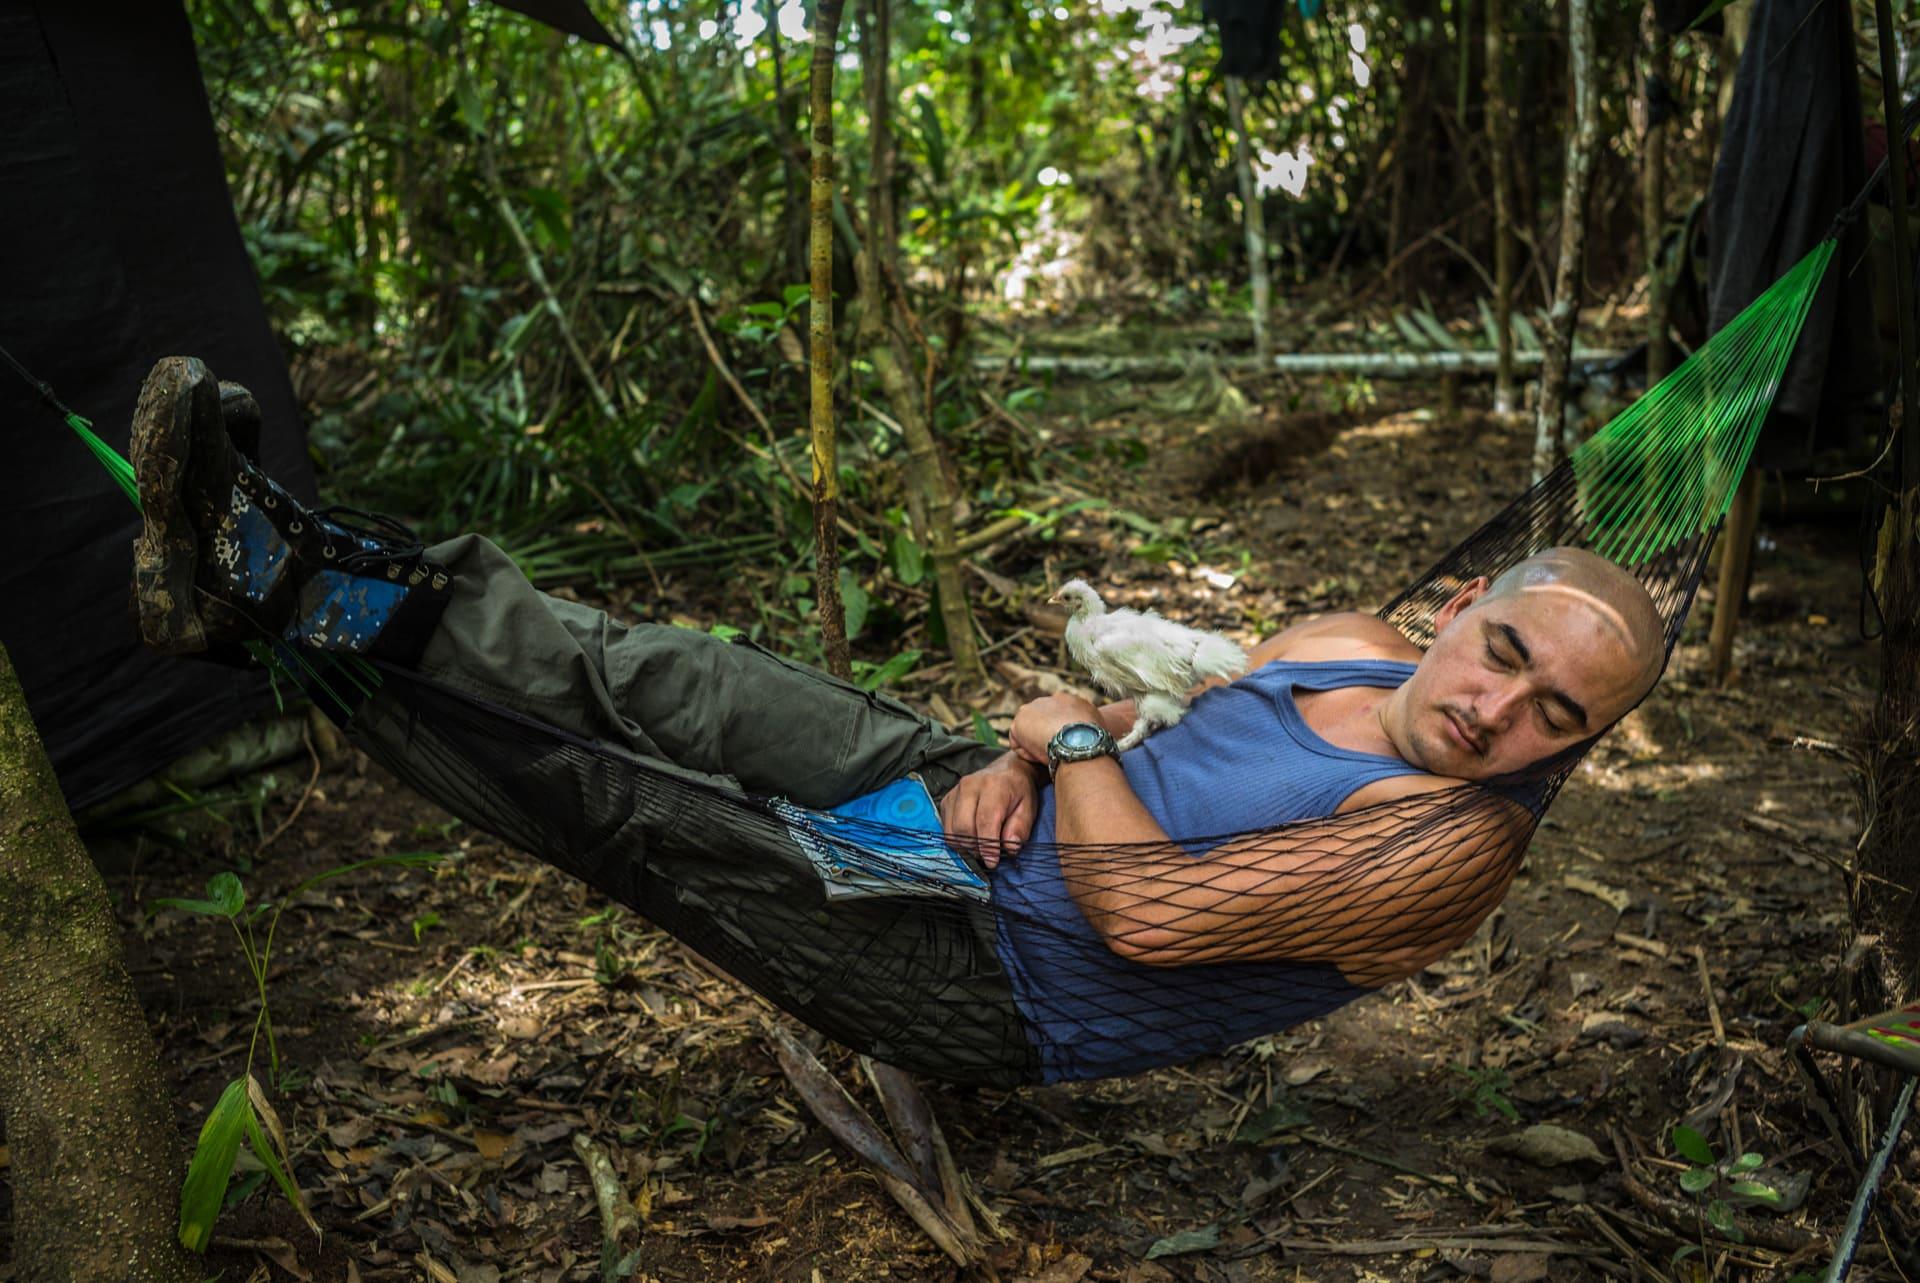 Arredondo_Juan_Photojournalism_FARC_019